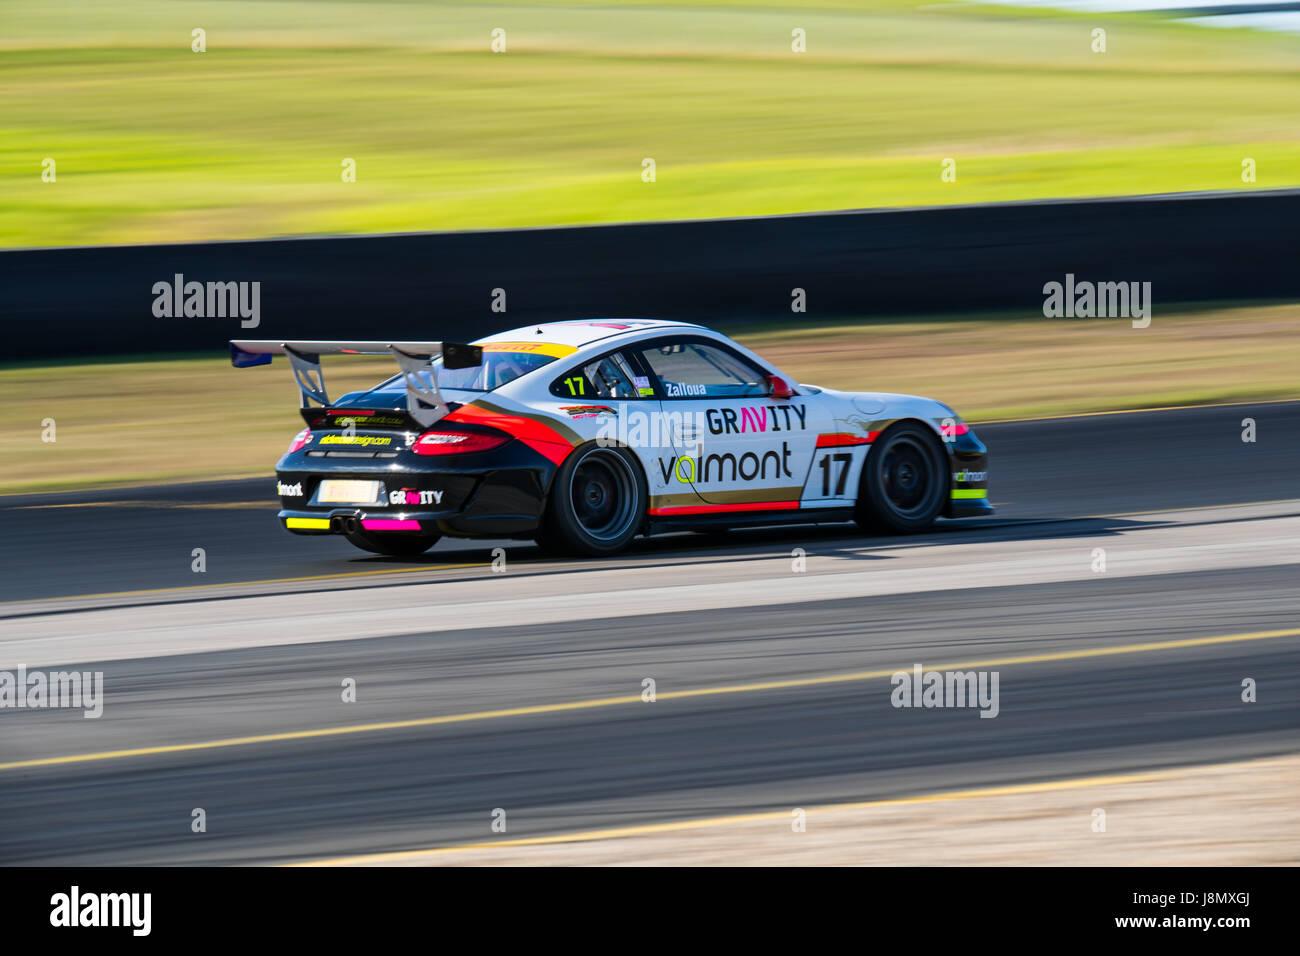 Motorsport-Park Sydney, Australien. 28. Mai 2017.  360-Motorsport. Anthony fesselte/Alamy Live-Nachrichten Stockbild